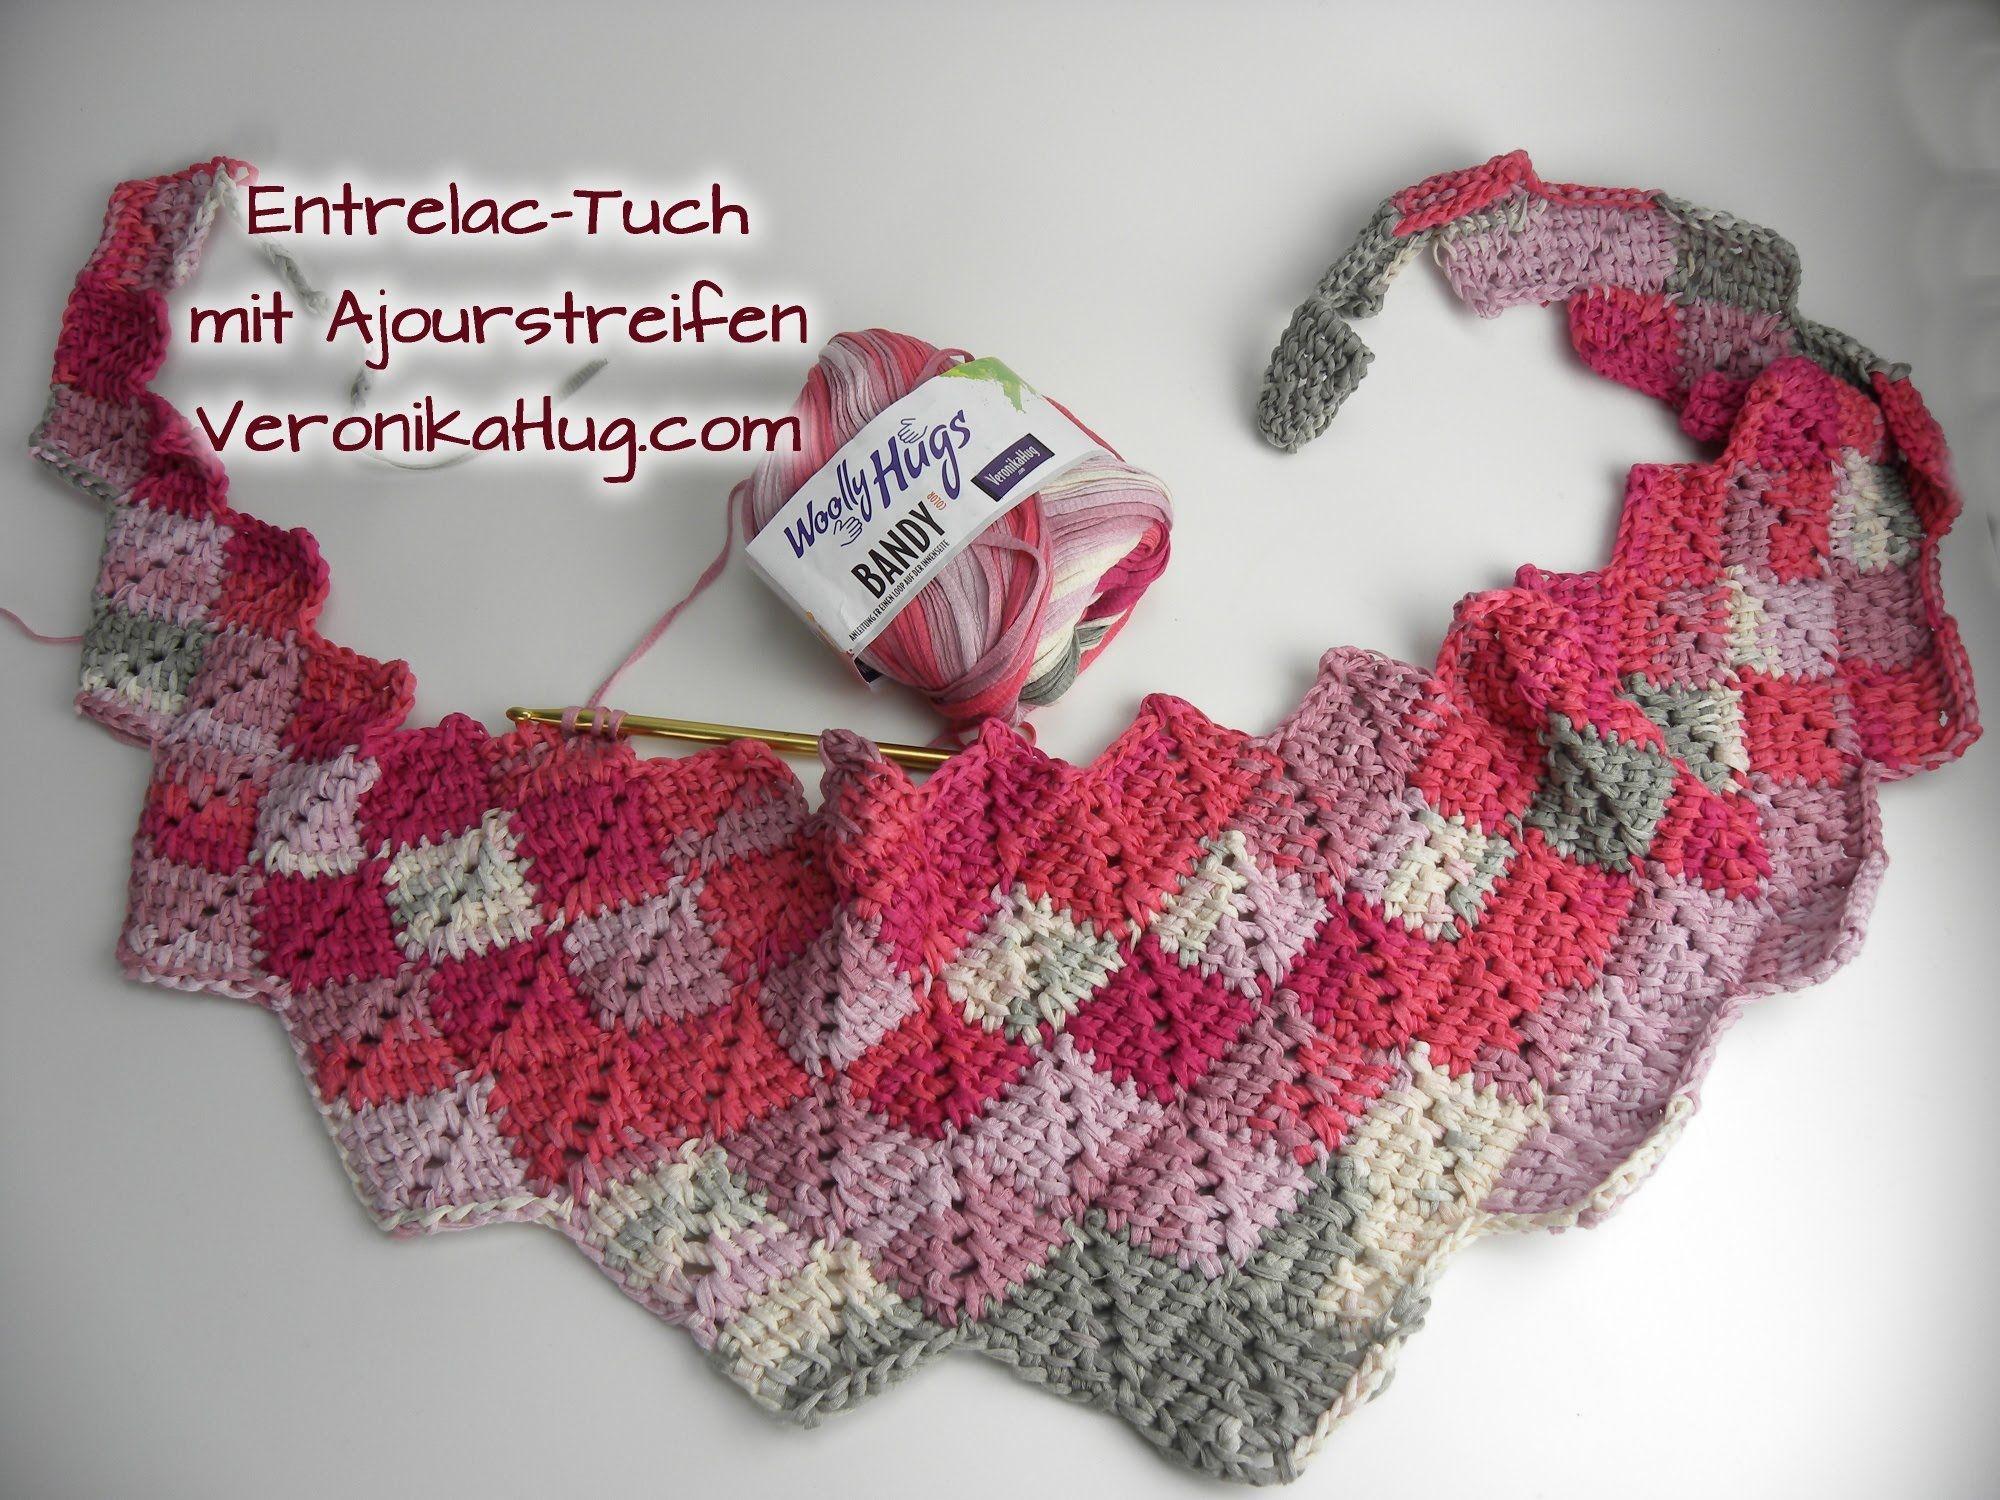 Häkeln Entrelac-Tuch - Woolly Hugs BANDY Veronika Hug - Teil 1 ...